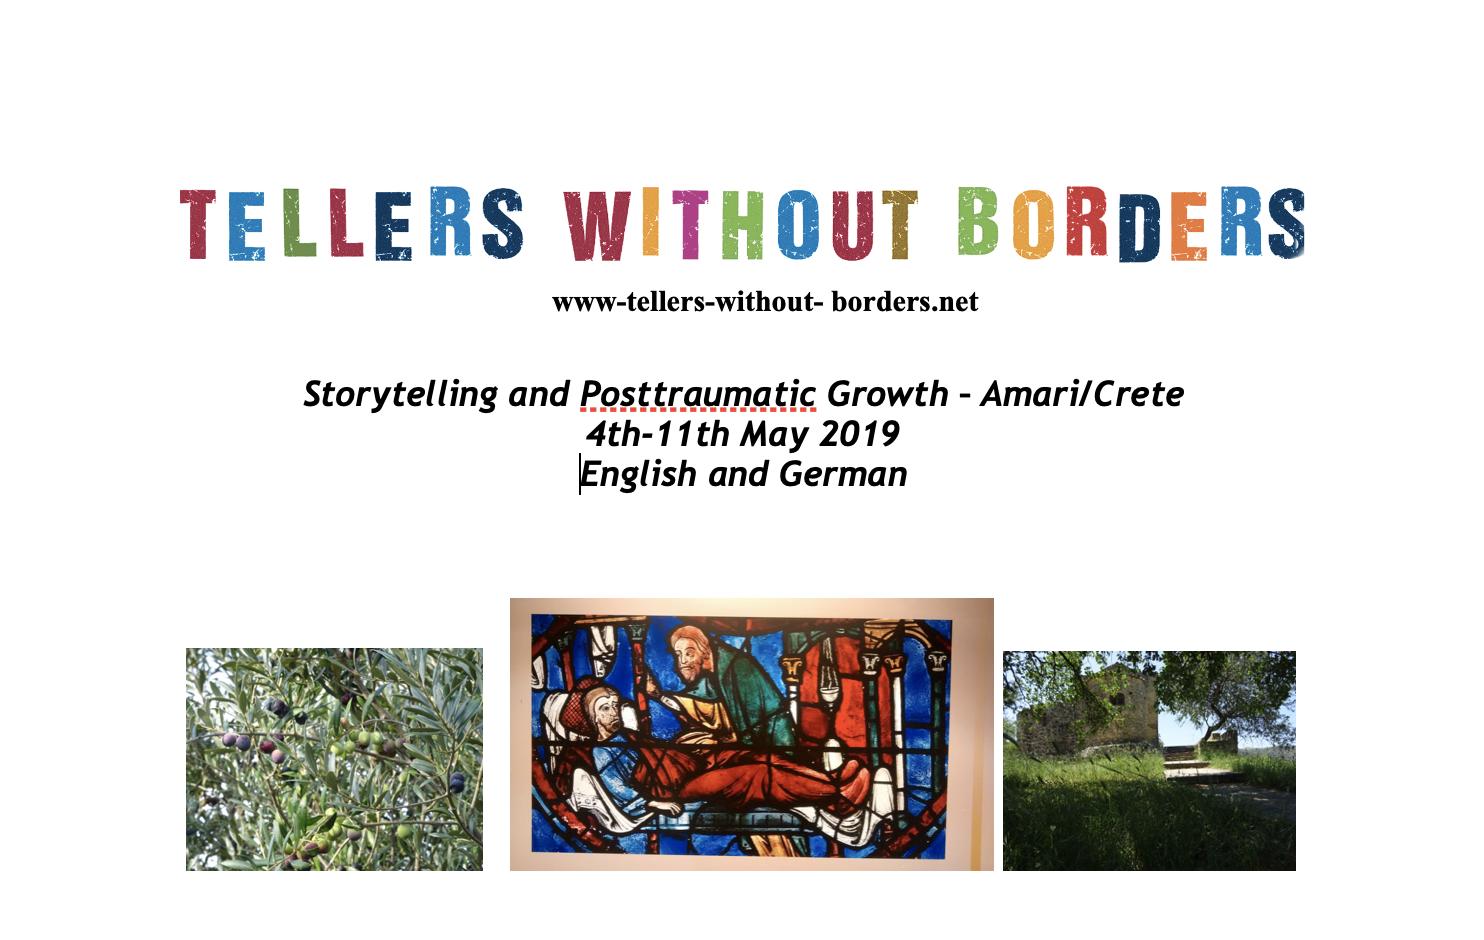 Storytelling and Posttraumatic Growth in Amari/Crete